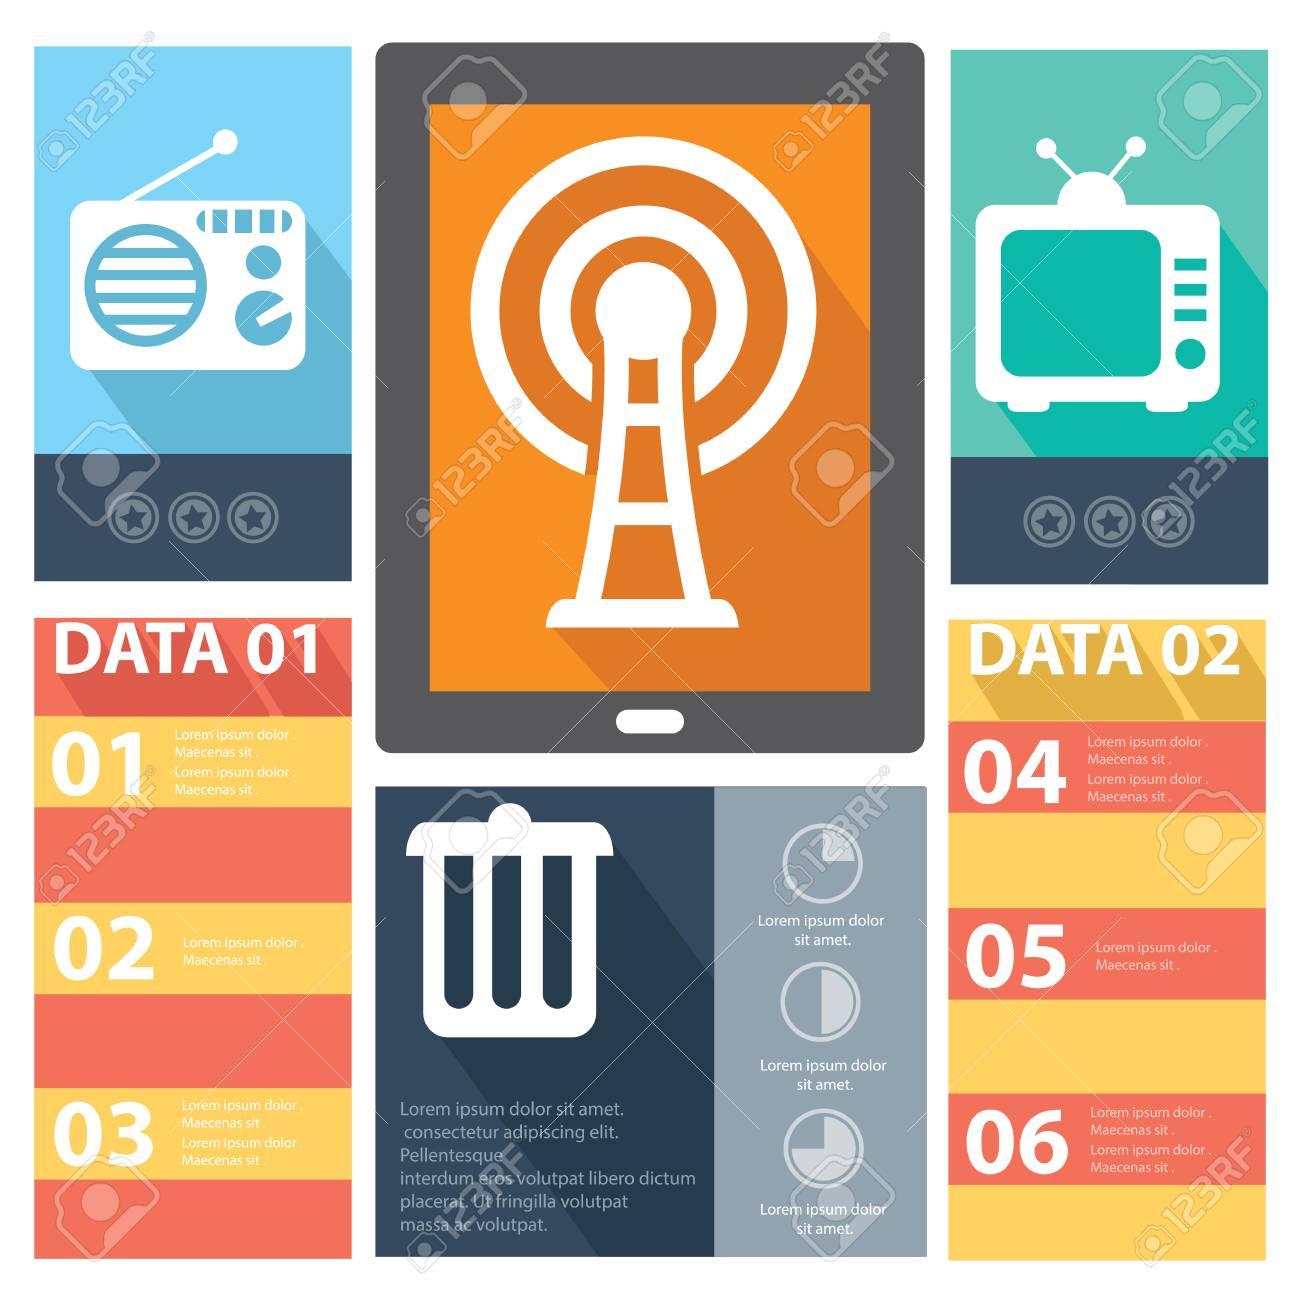 Media concept banners,vector Stock Vector - 27168562